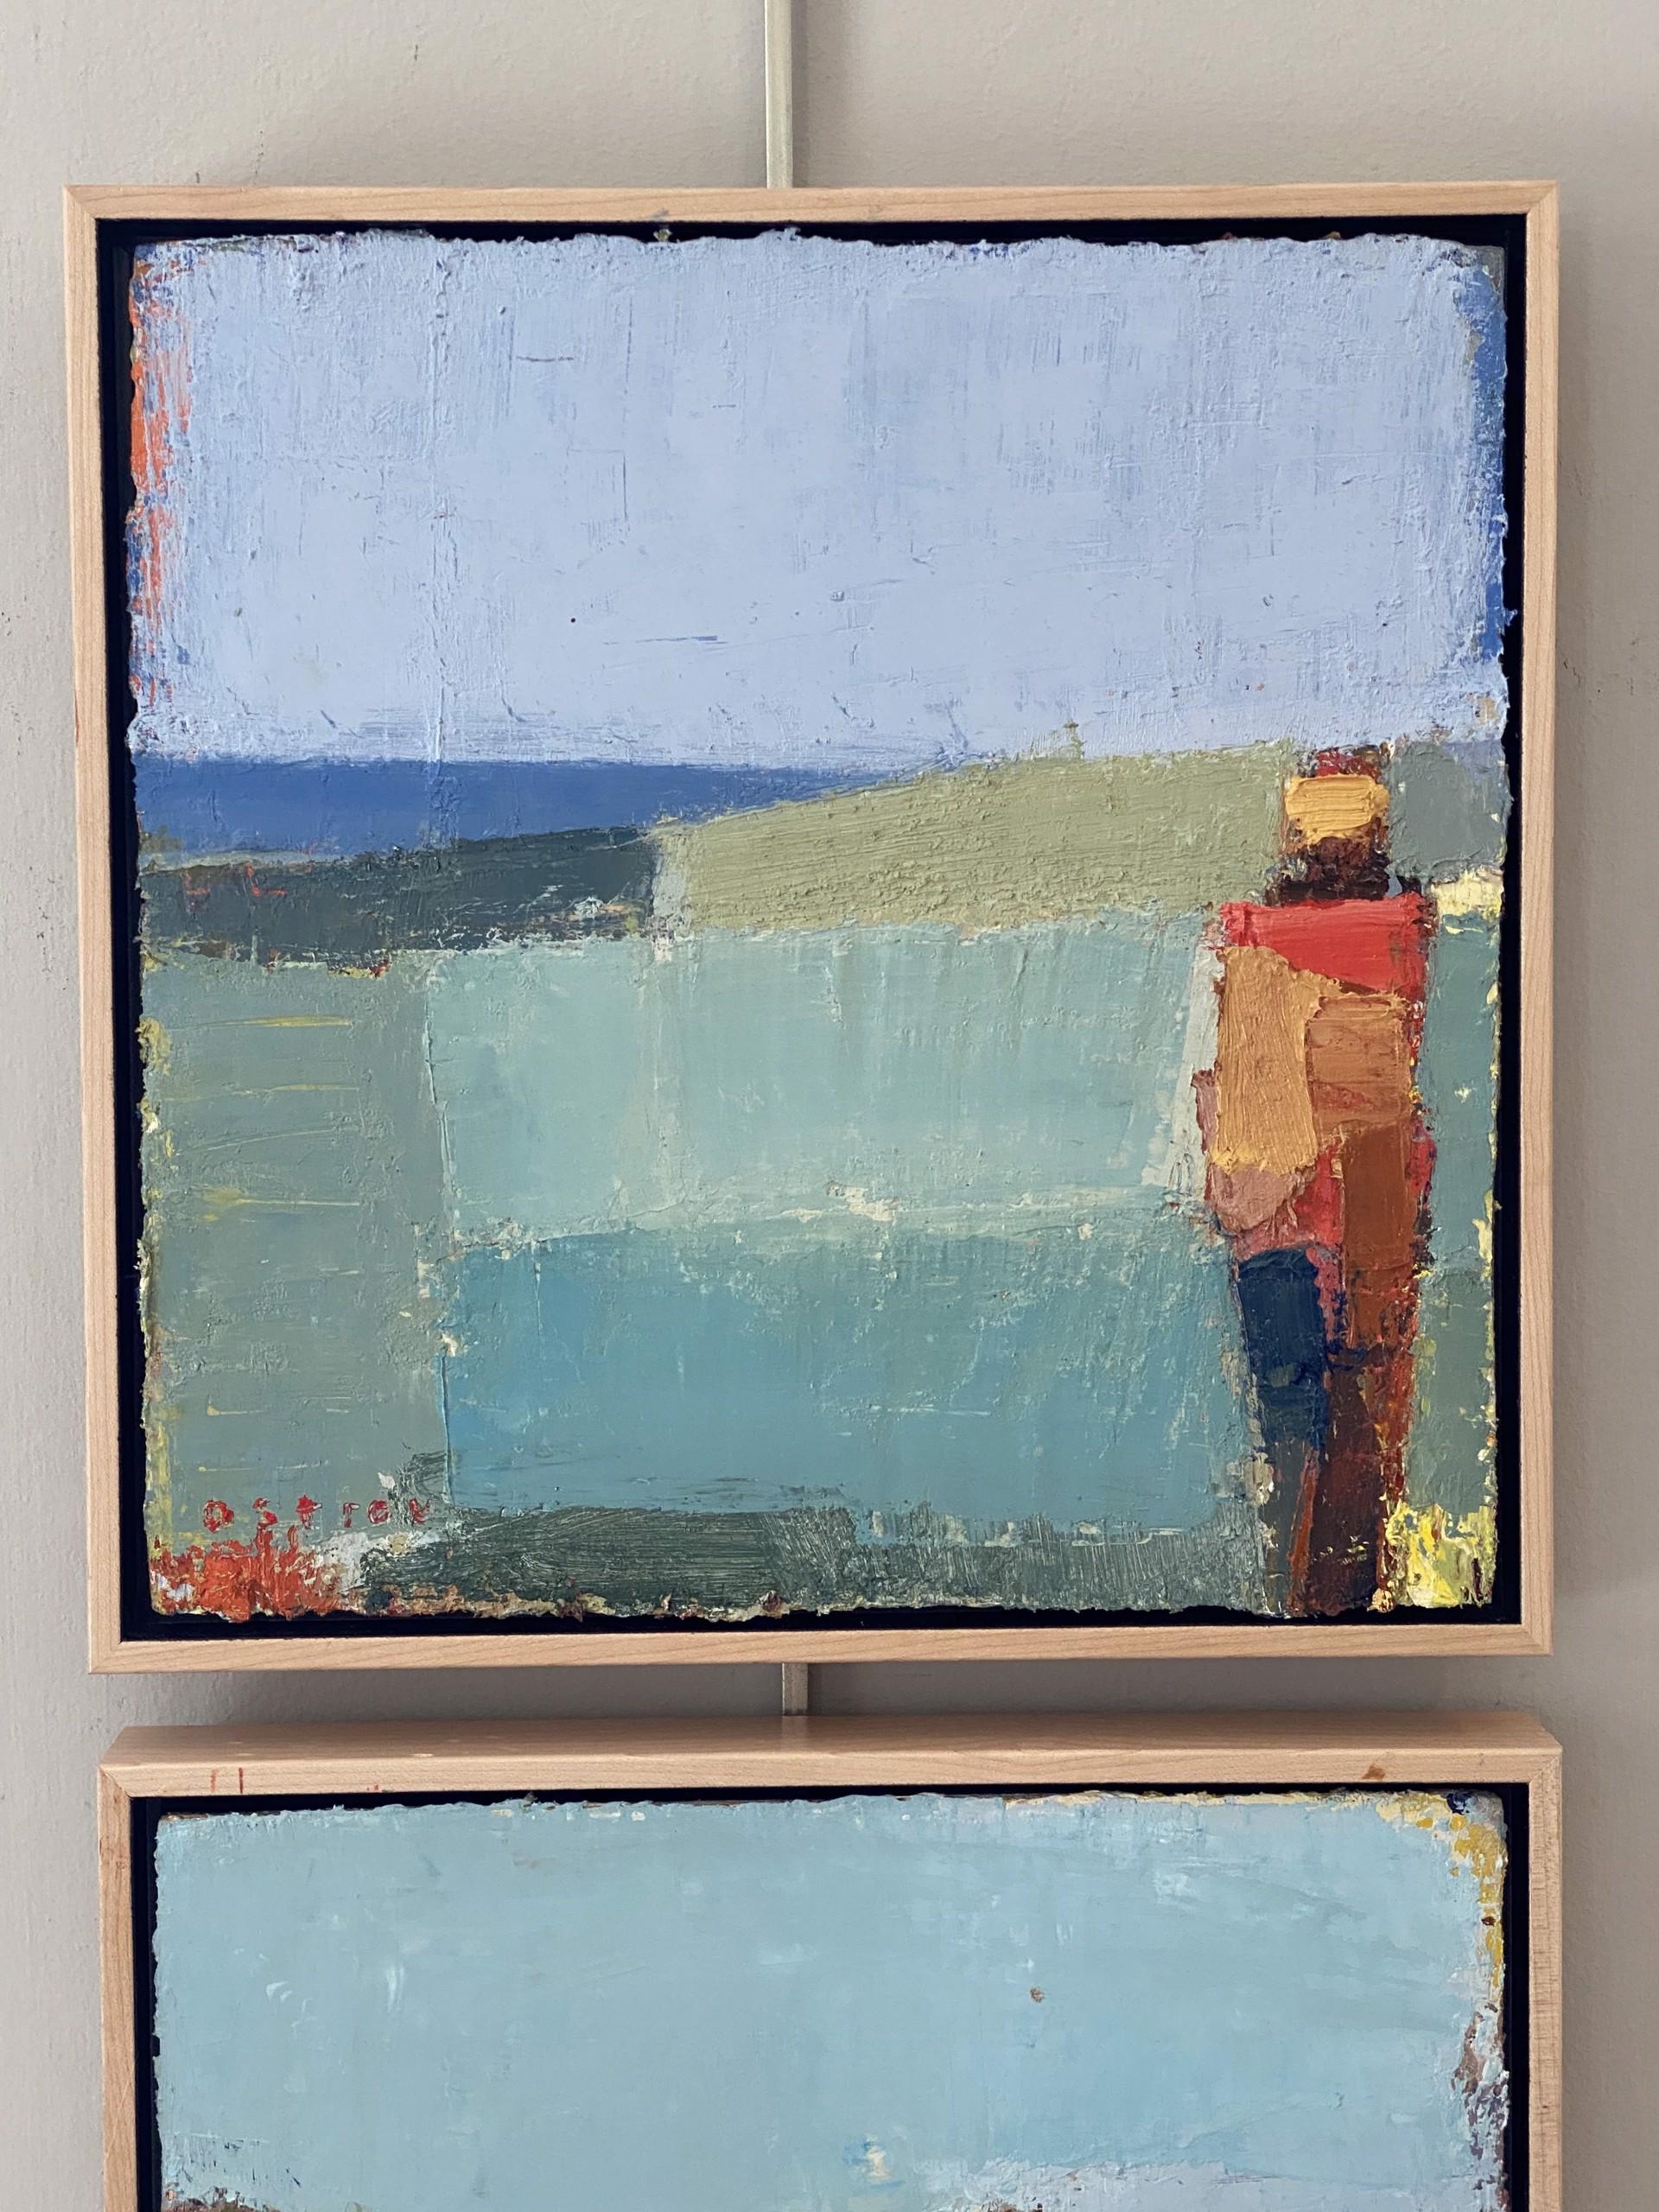 Observer by Sandy Ostrau